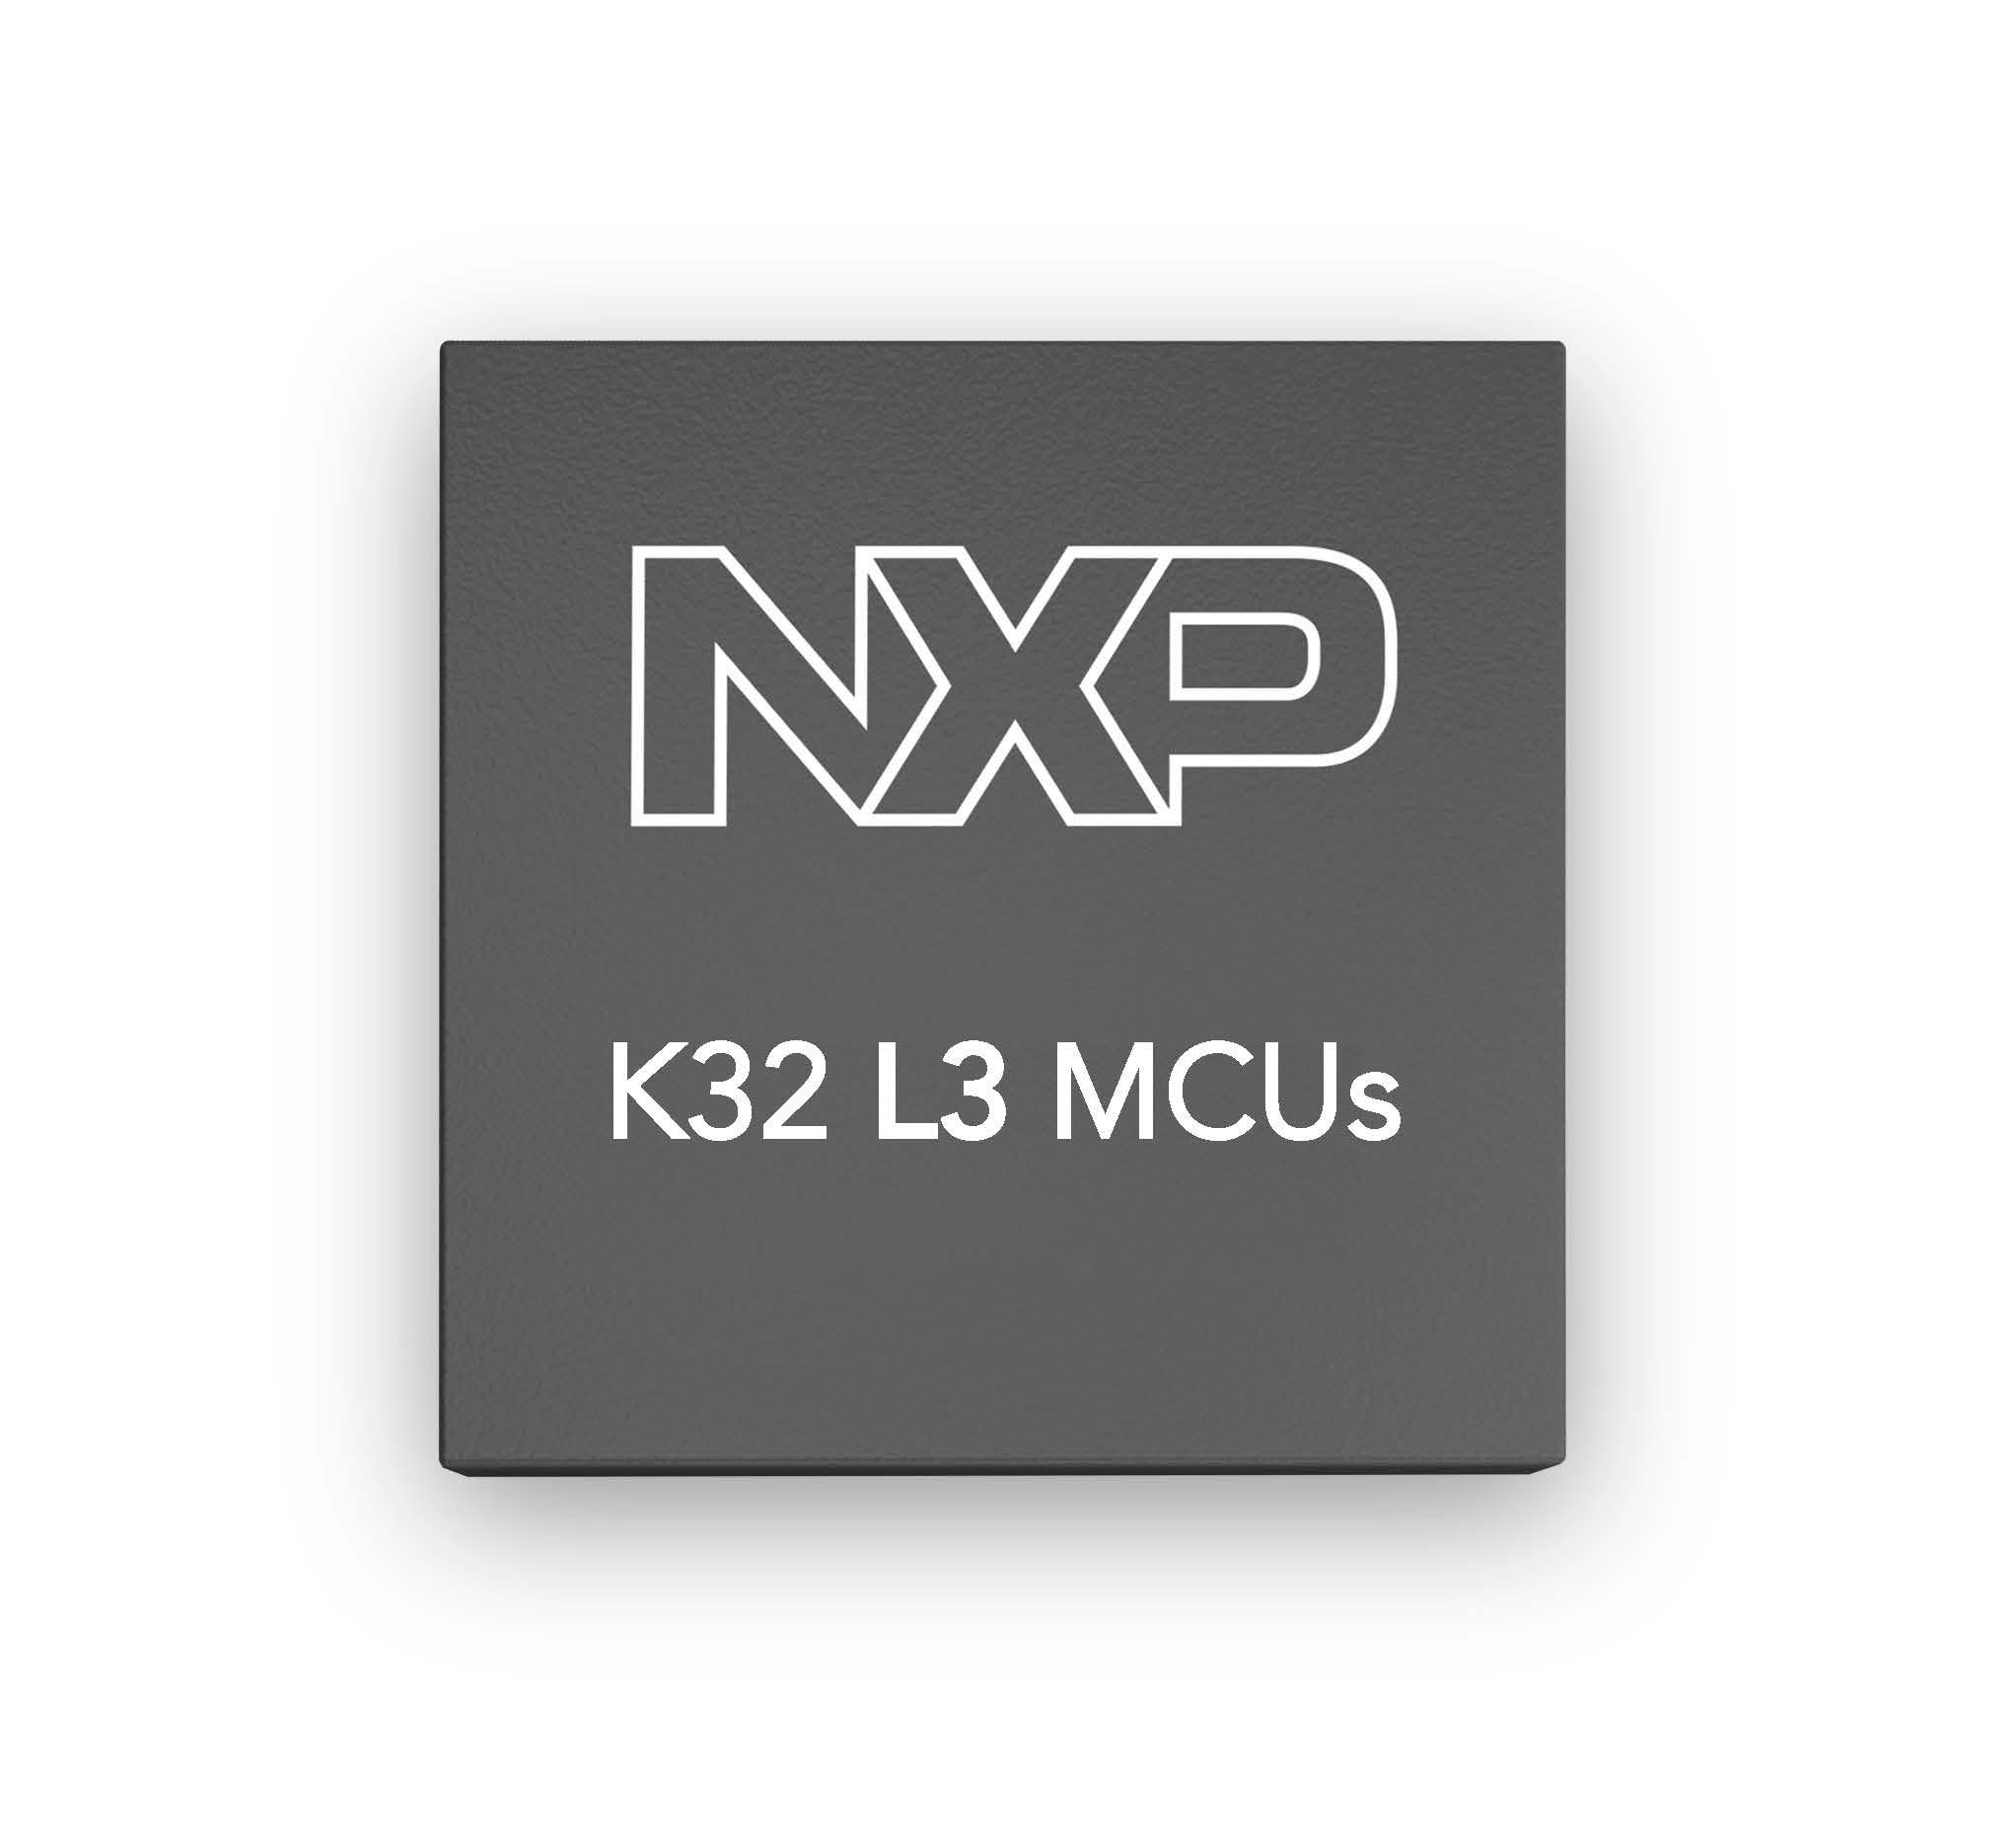 K32 L3 MCUs_Chip Shot.jpg